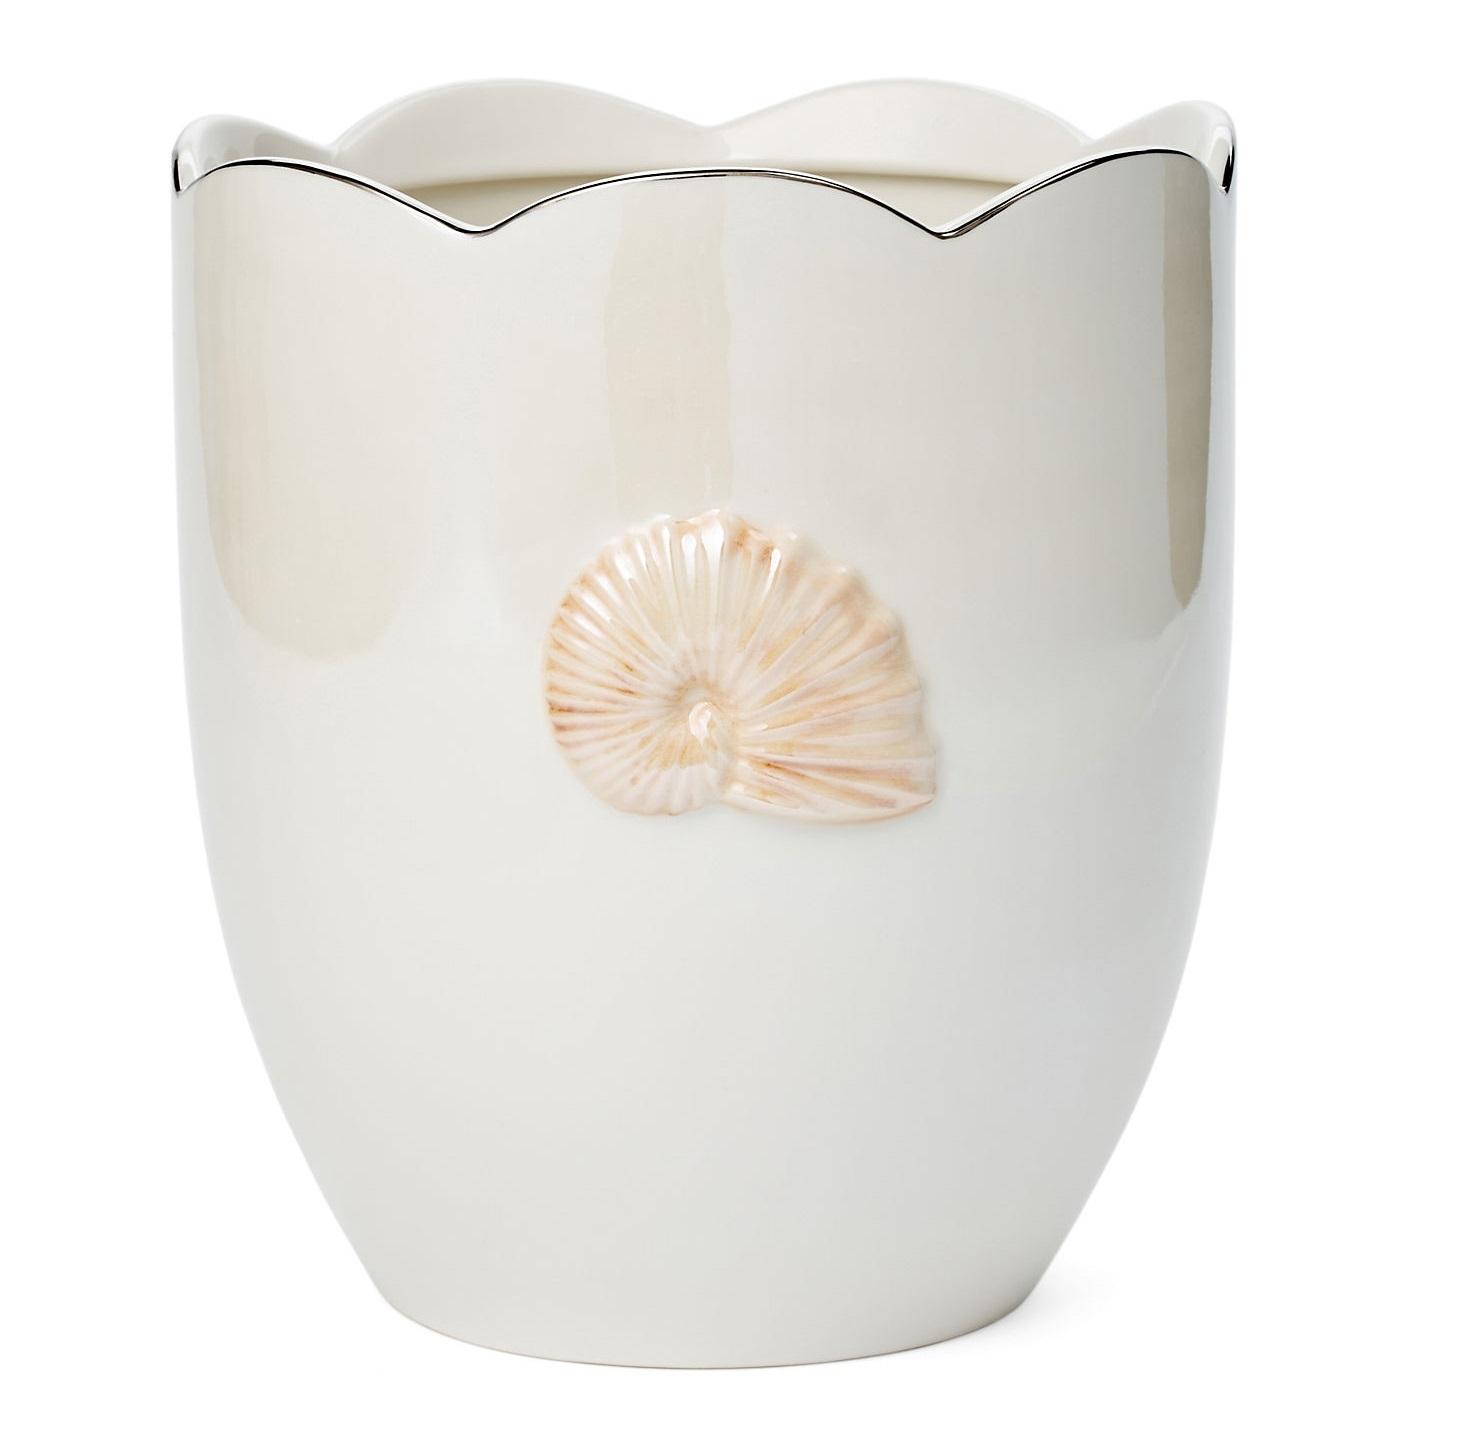 Ведра для мусора Ведро для мусора Mare Shells Pearl от Kassatex vedro-dlya-musora-mare-shells-pearl-ot-kassatex-ssha-kitay.jpg